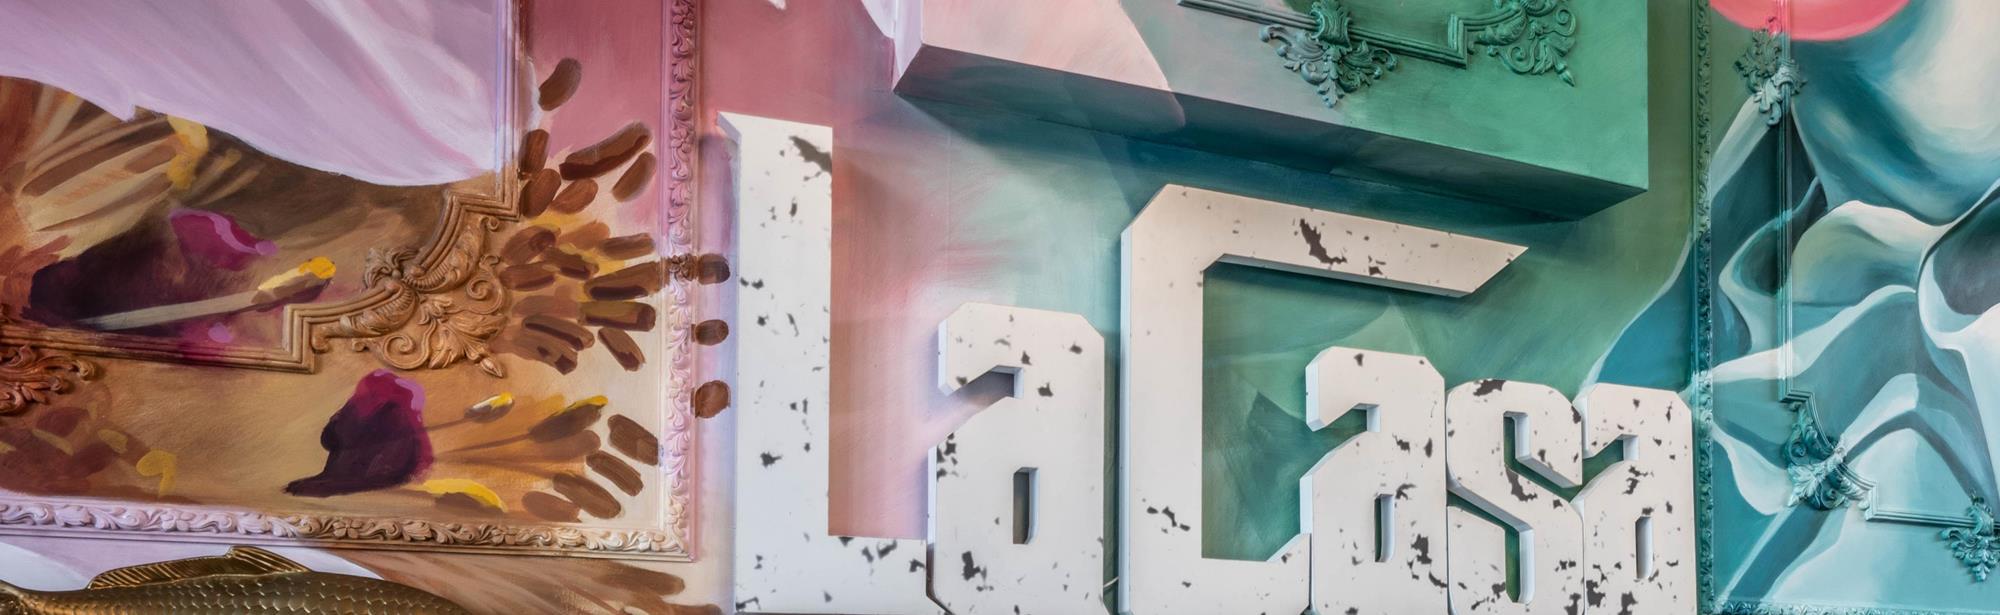 Hotel & Spaans/Italiaans Restaurant La Casa